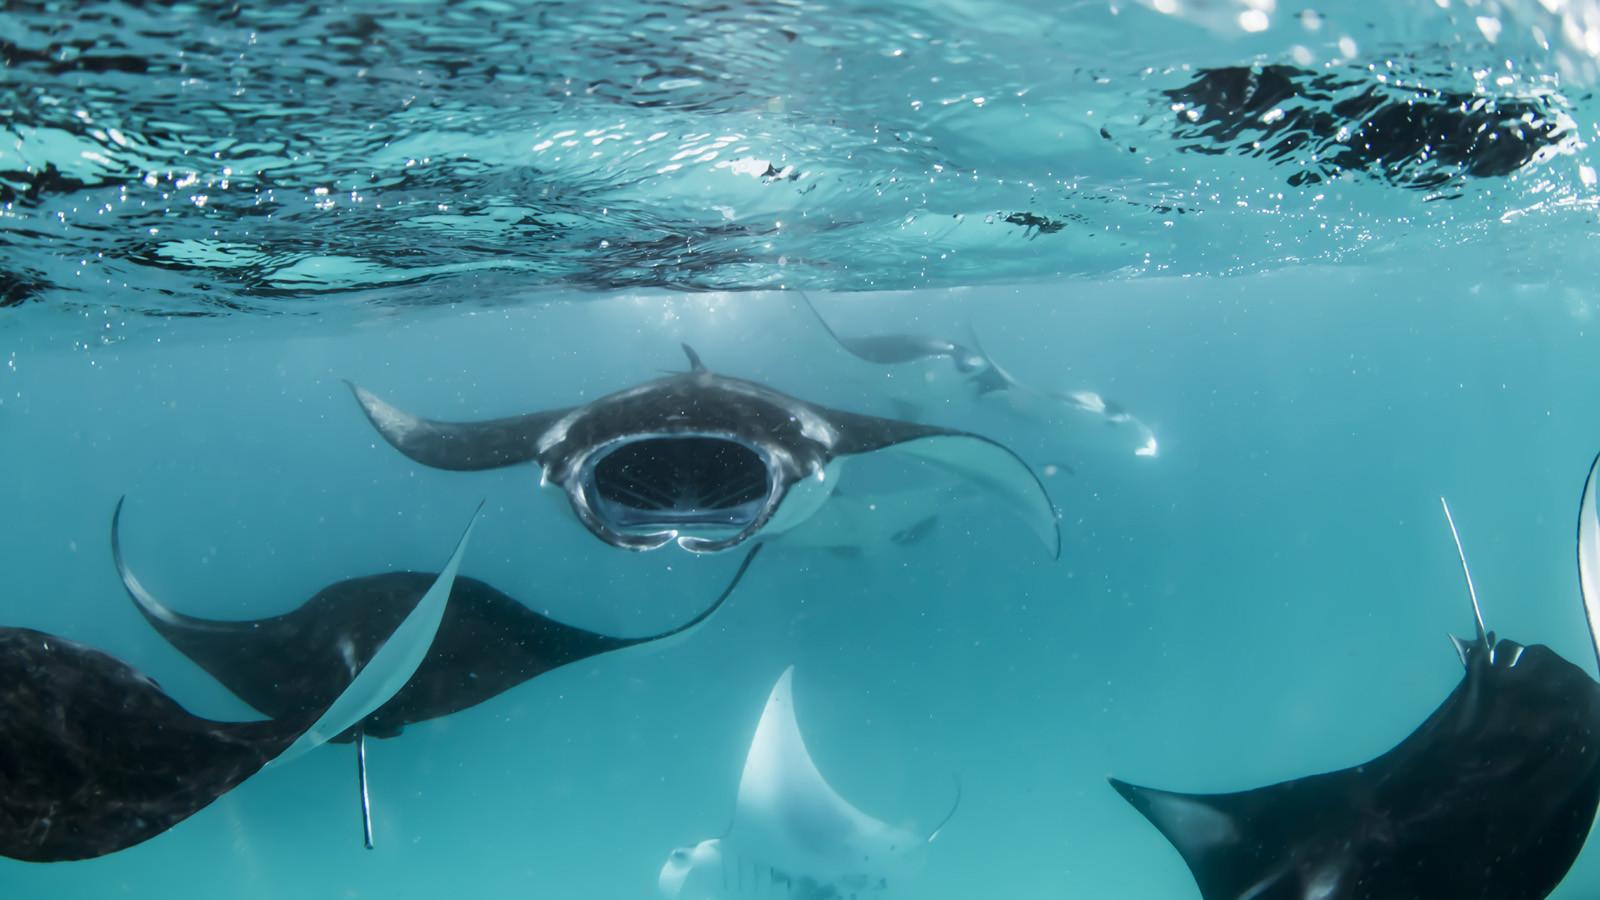 news-main-marine-savers-at-four-seasons-resort-maldives-beyond-the-plastic.1586956329.jpg